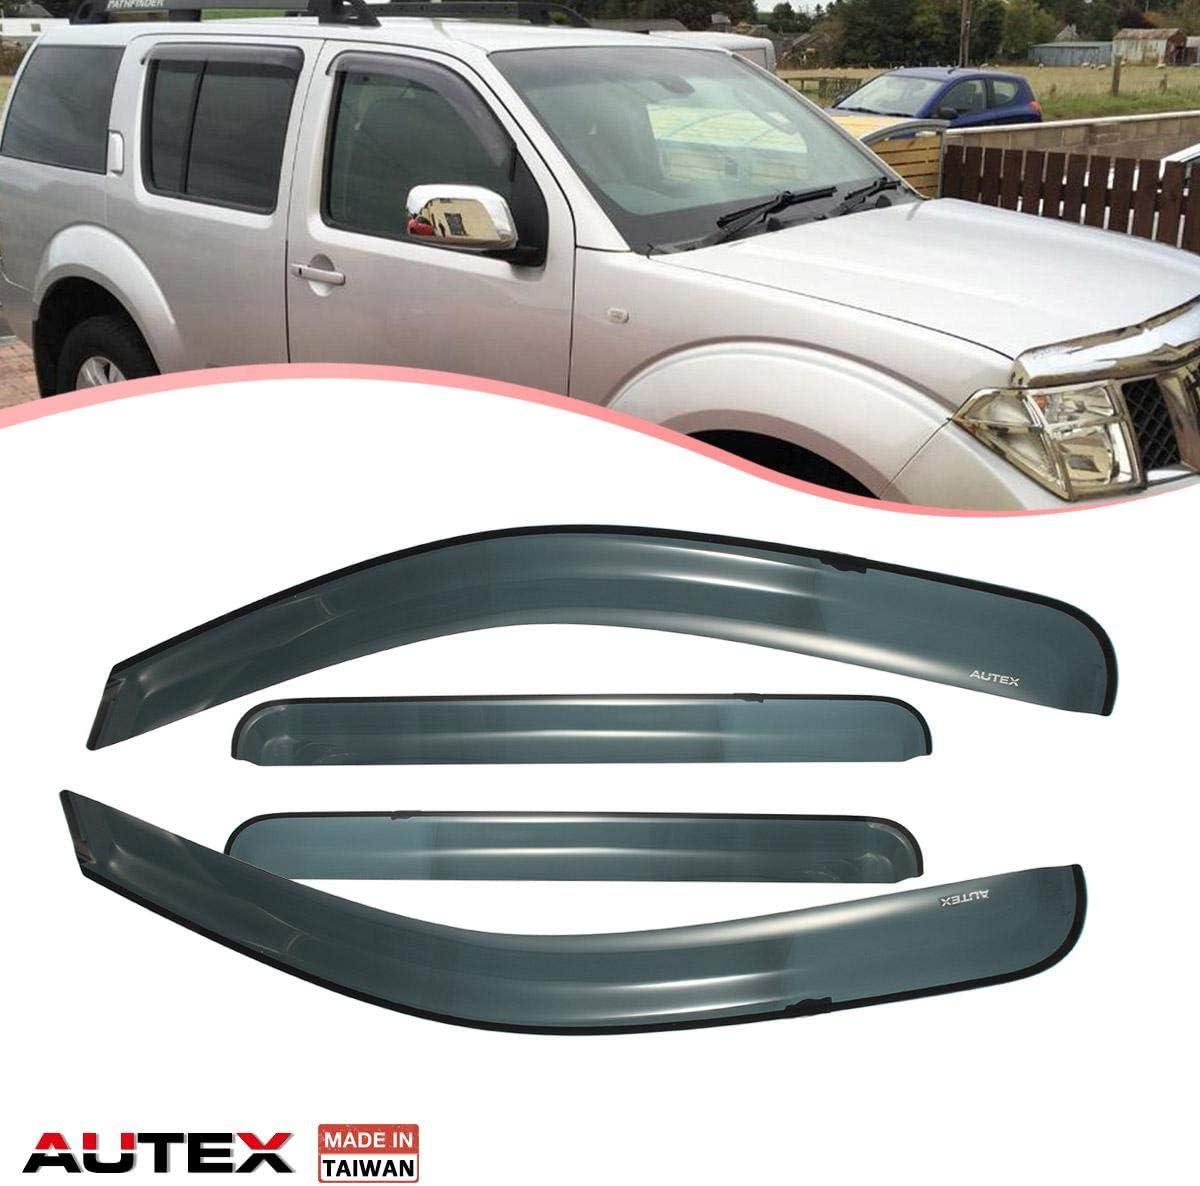 Tape-On Rain Guard Window Visor Dark Grey 4pcs For 2005-2012 Nissan Pathfinder